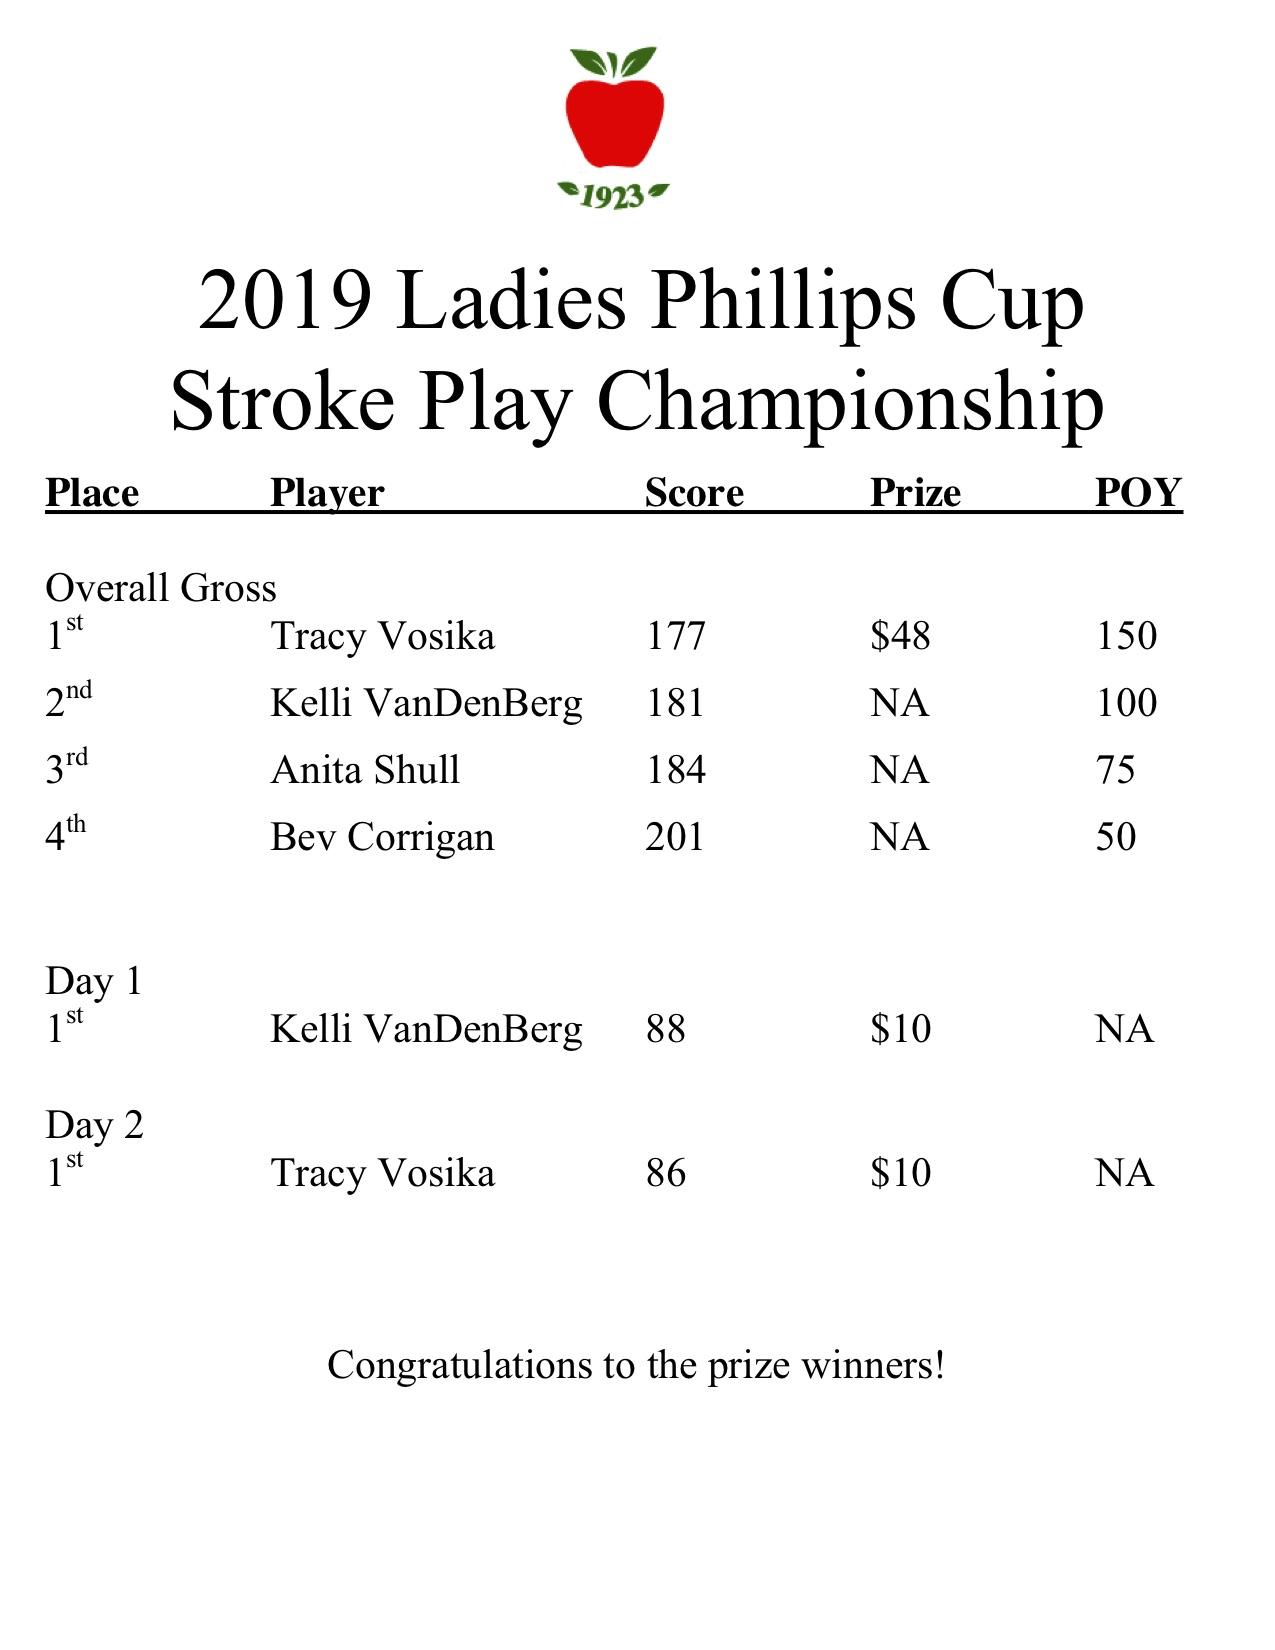 2019 ladies phillips cup results.jpg